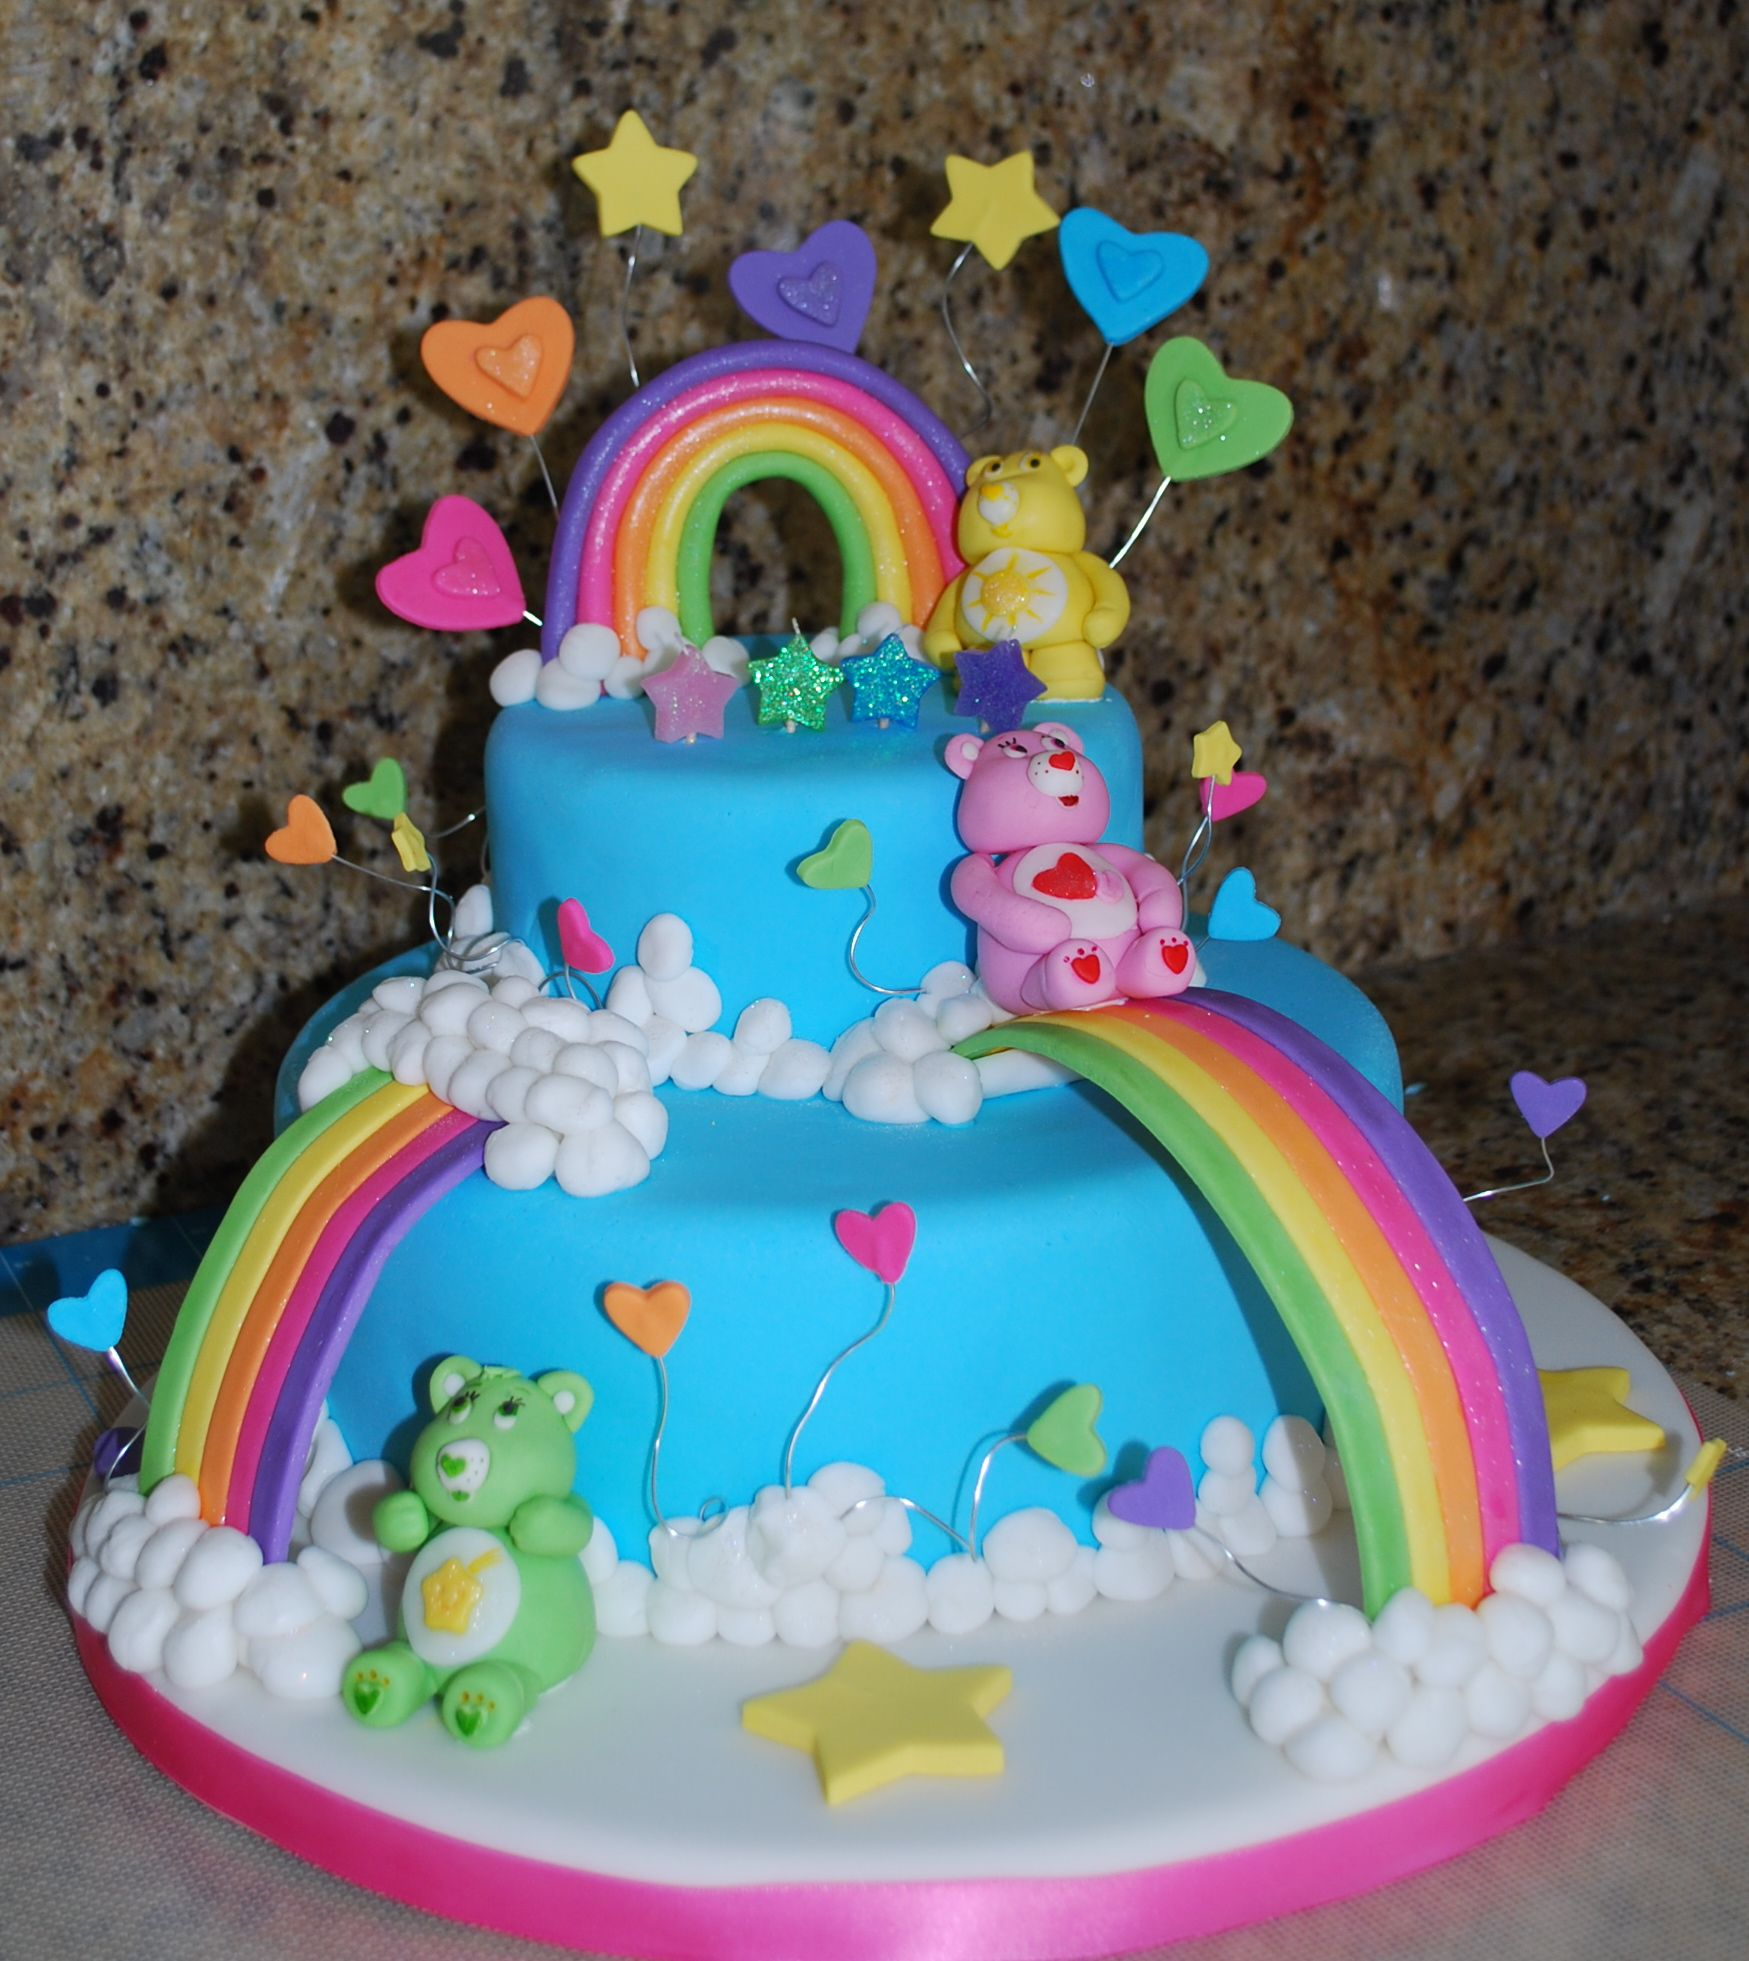 Fabulous Care Bears Care Bear Cakes Childrens Birthday Cakes Bear Cakes Funny Birthday Cards Online Alyptdamsfinfo